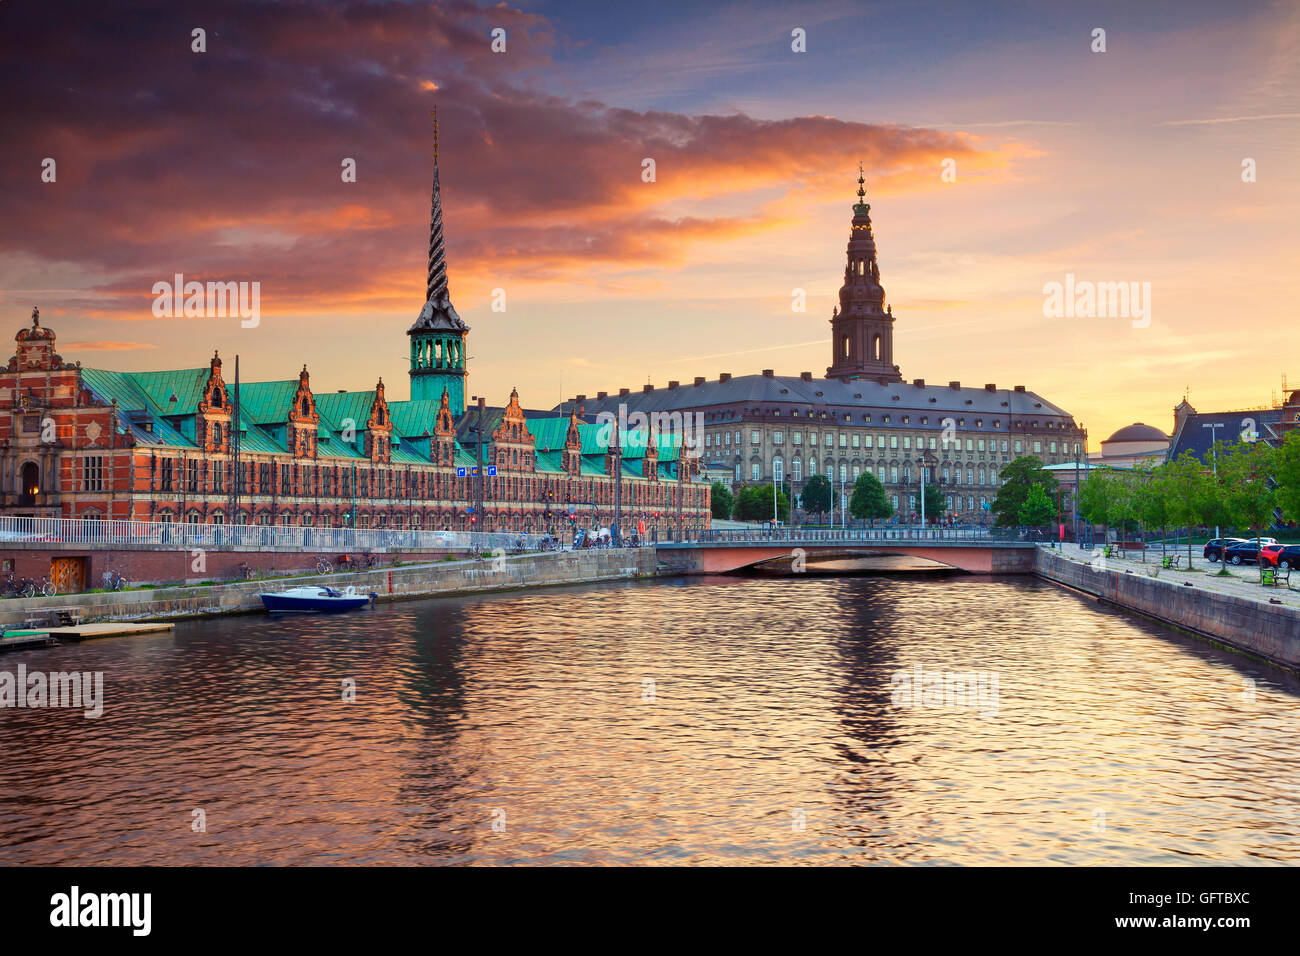 Copenhagen. Image of Copenhagen, Denmark during beautiful sunset. - Stock Image